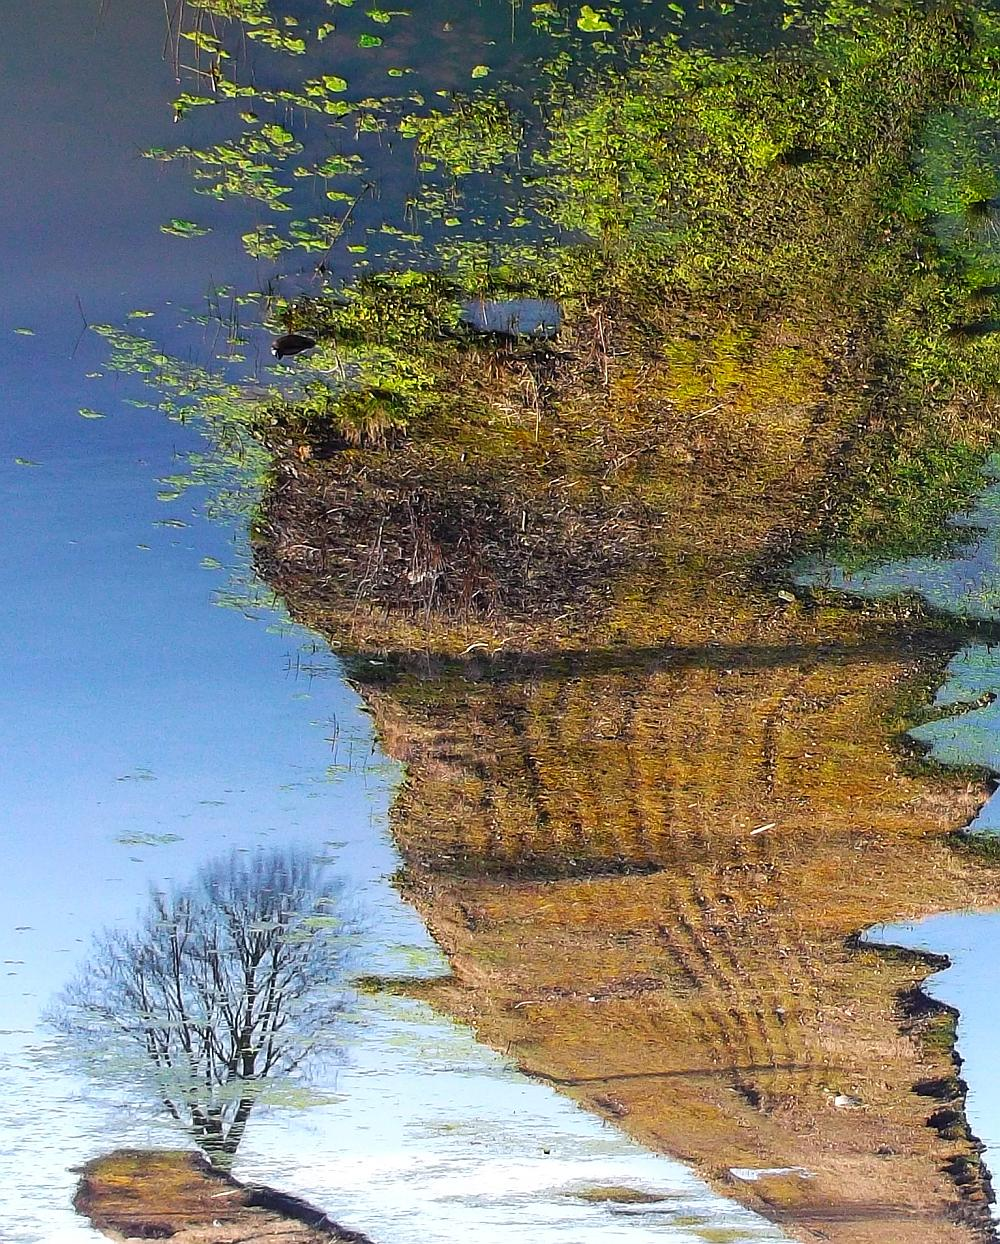 Iven Einszehn Foto Landschaft in Hammerbrook (zerst�rt)